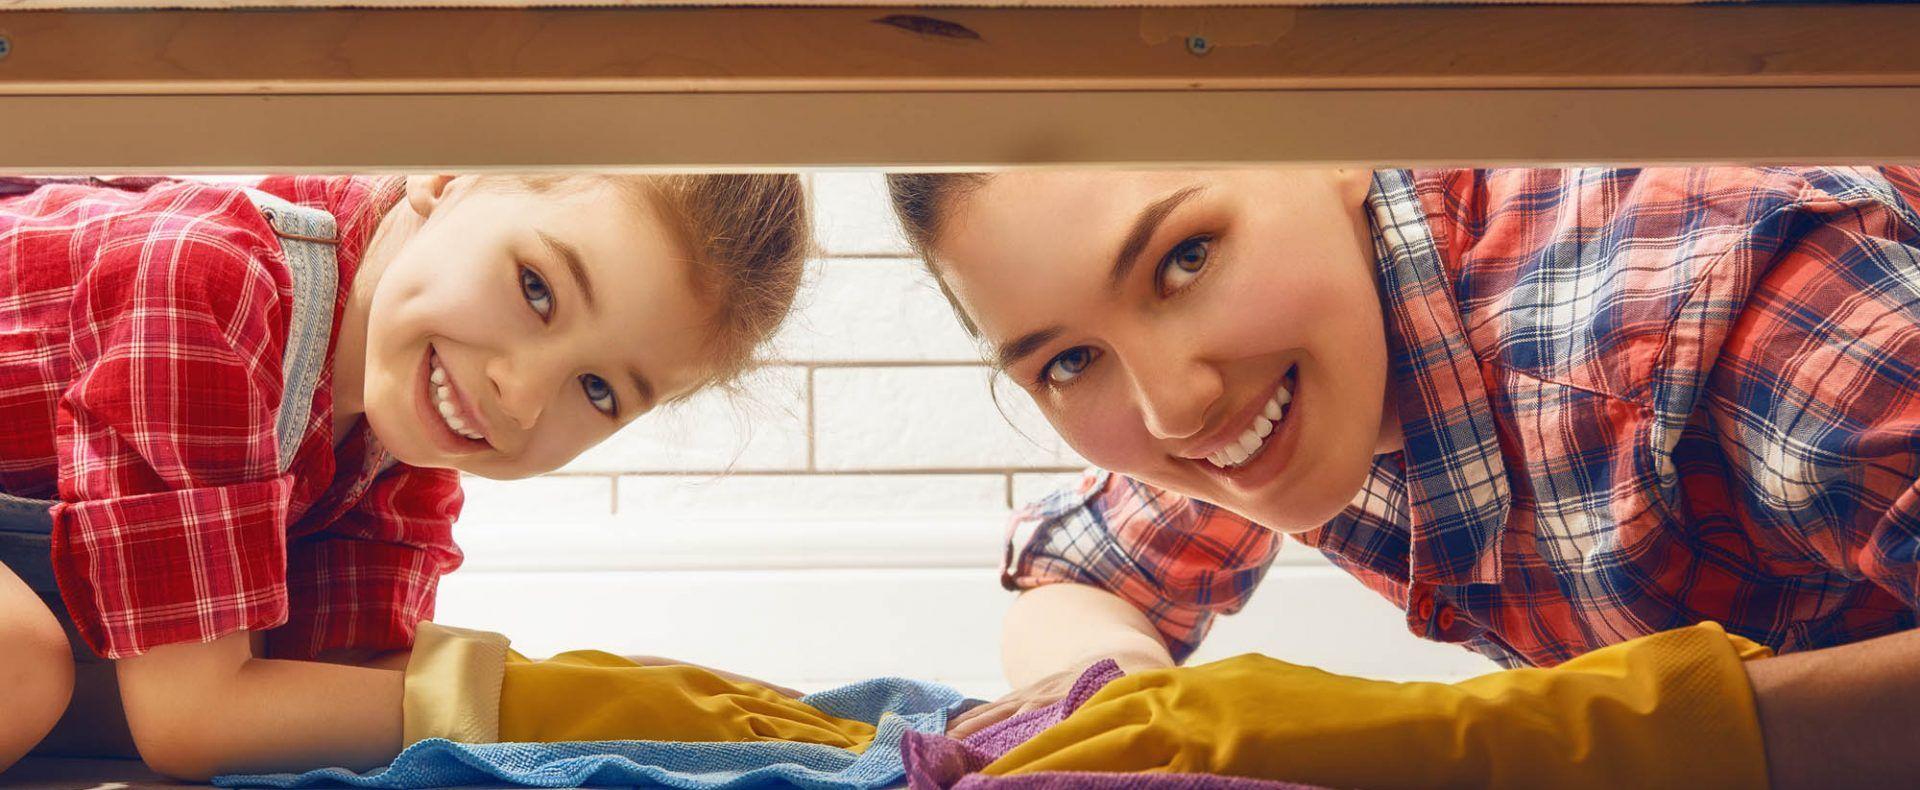 6 Increíbles hábitos para tener tu hogar limpio